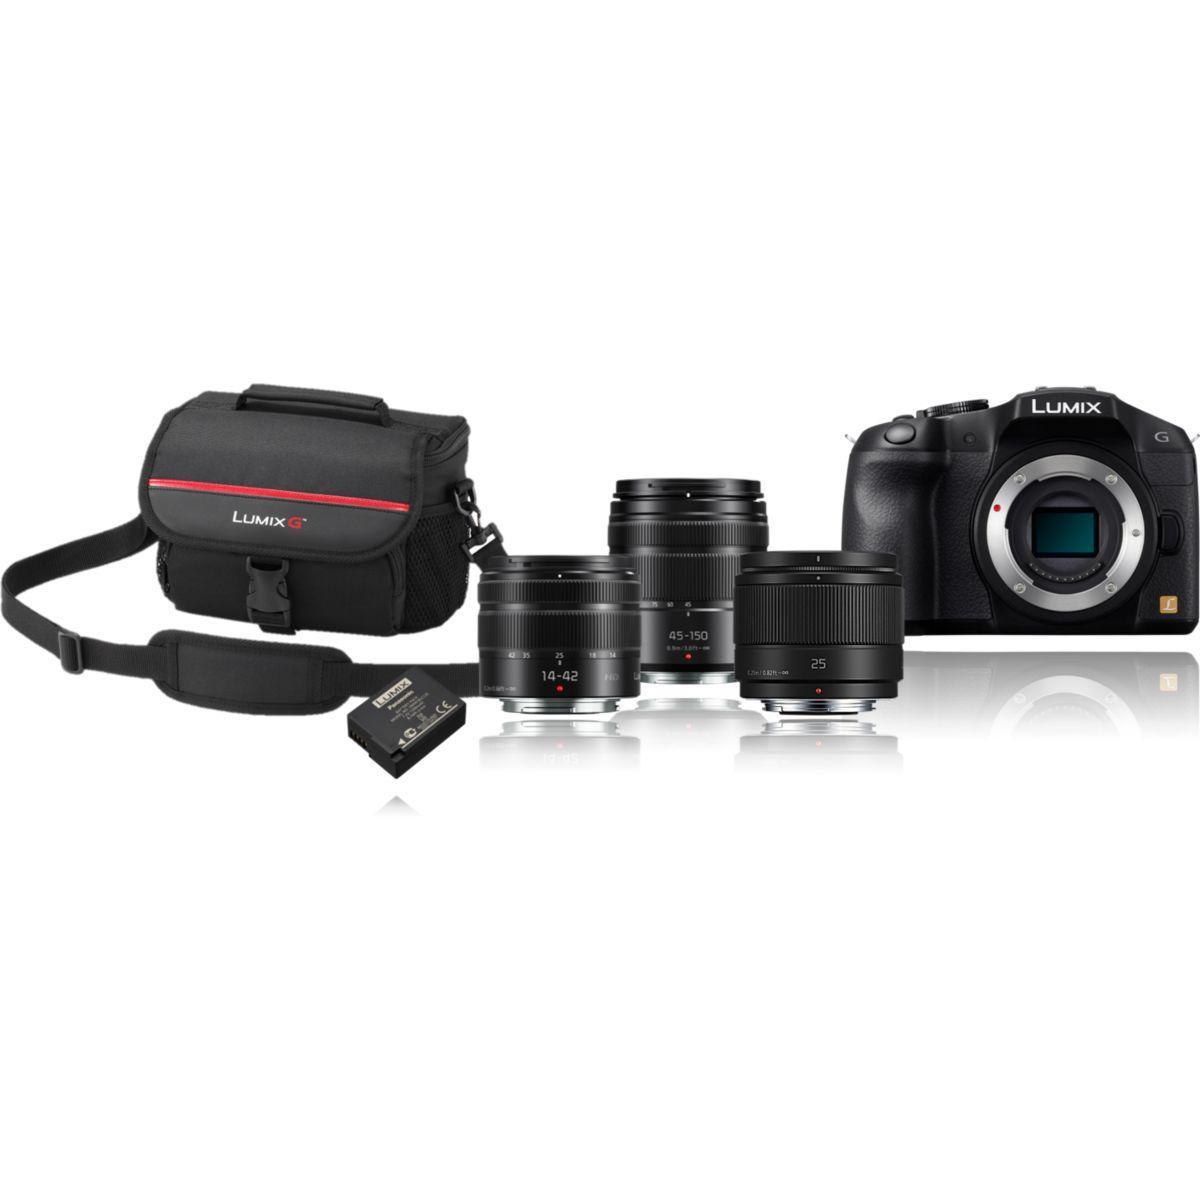 Appareil photo hybride panasonic dmc-g6 + 14-42mm + 45-150m + 25mm (photo)